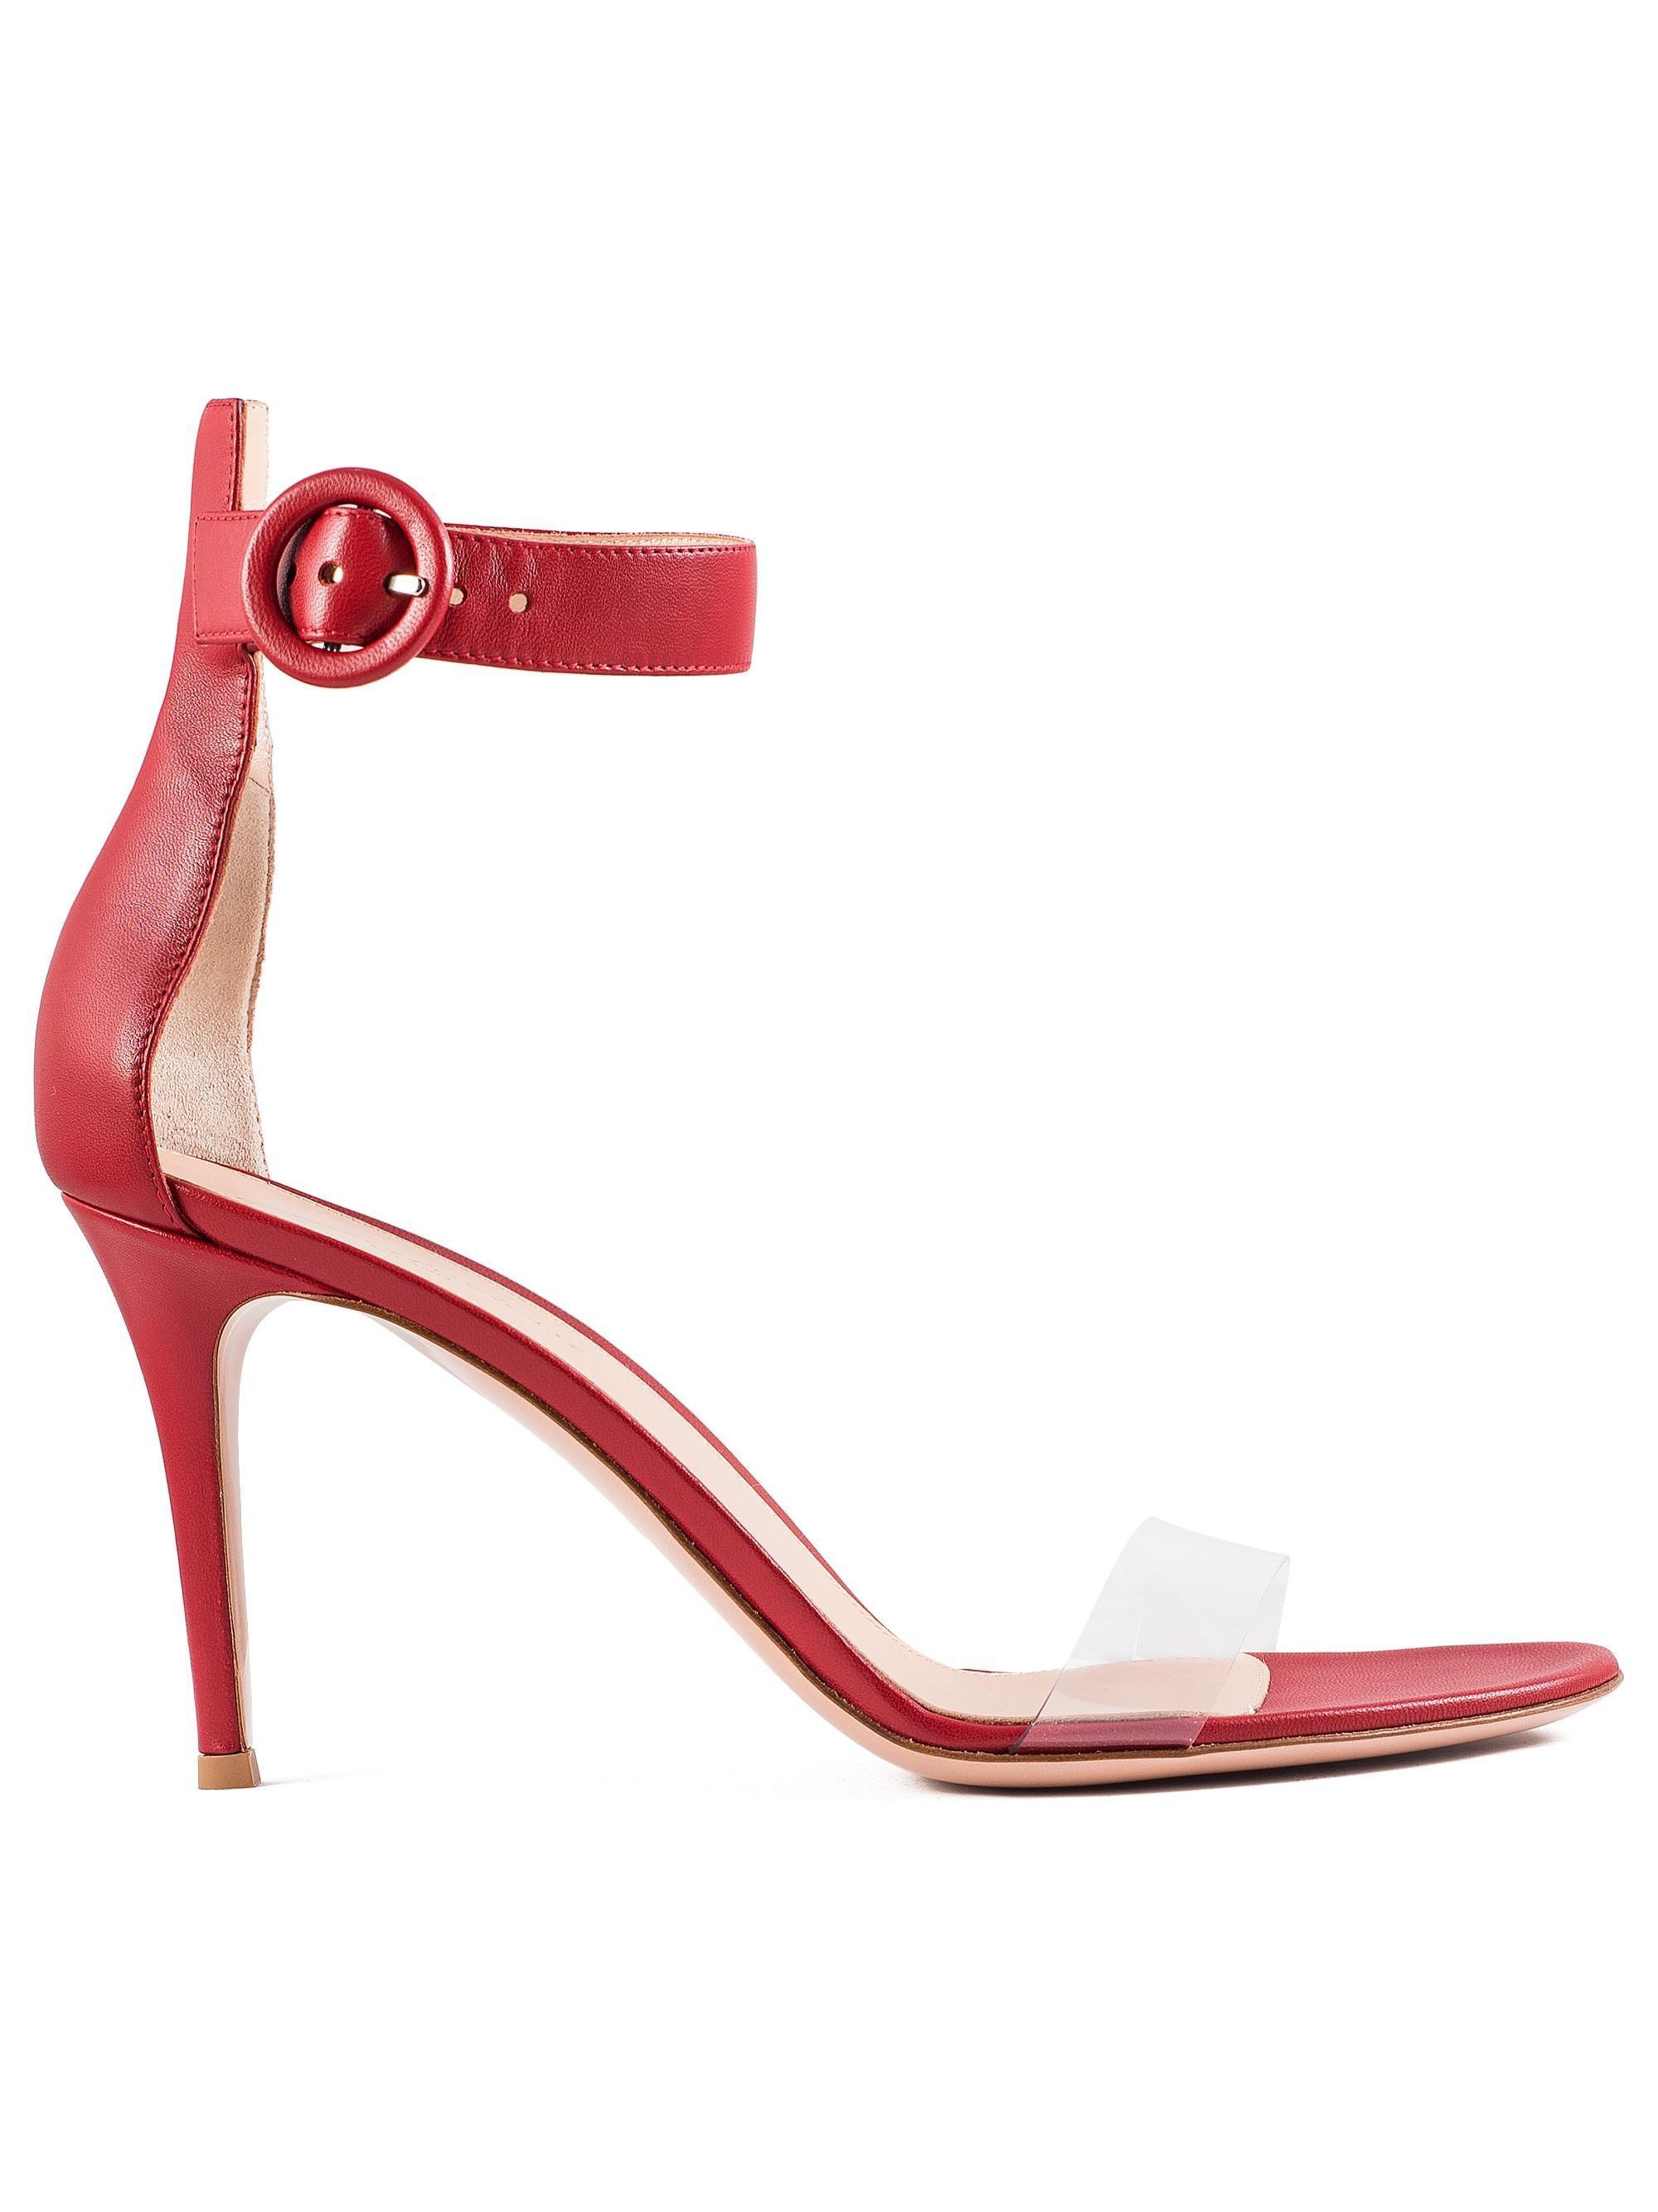 cheap perfect cheap price Gianvito Rossi Stella Leather & PVC Sandals nicekicks gpbLmk